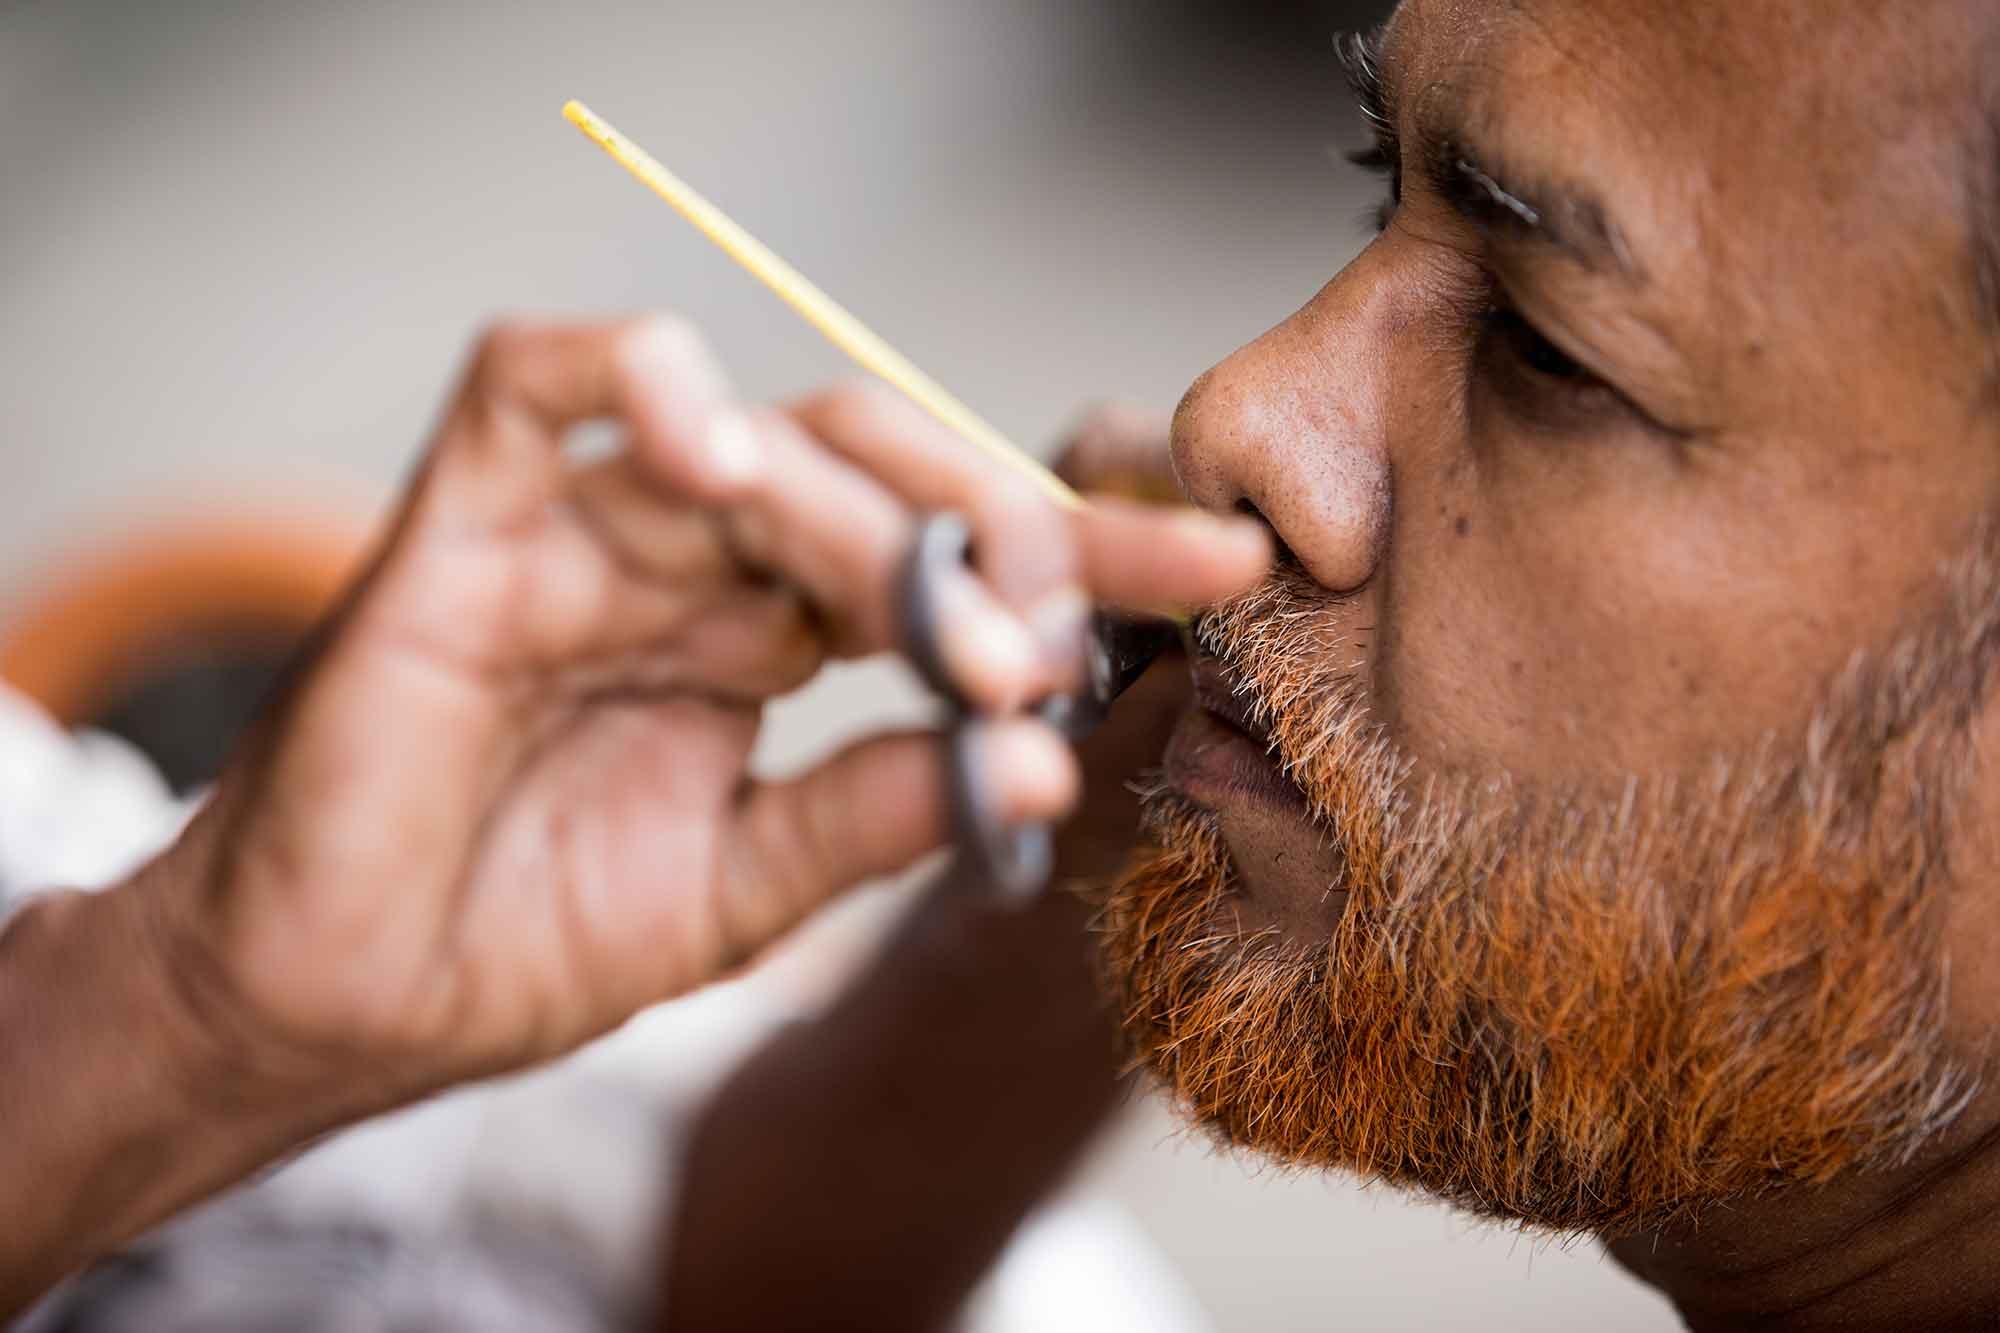 beard-trimming-streets-kolkata-india